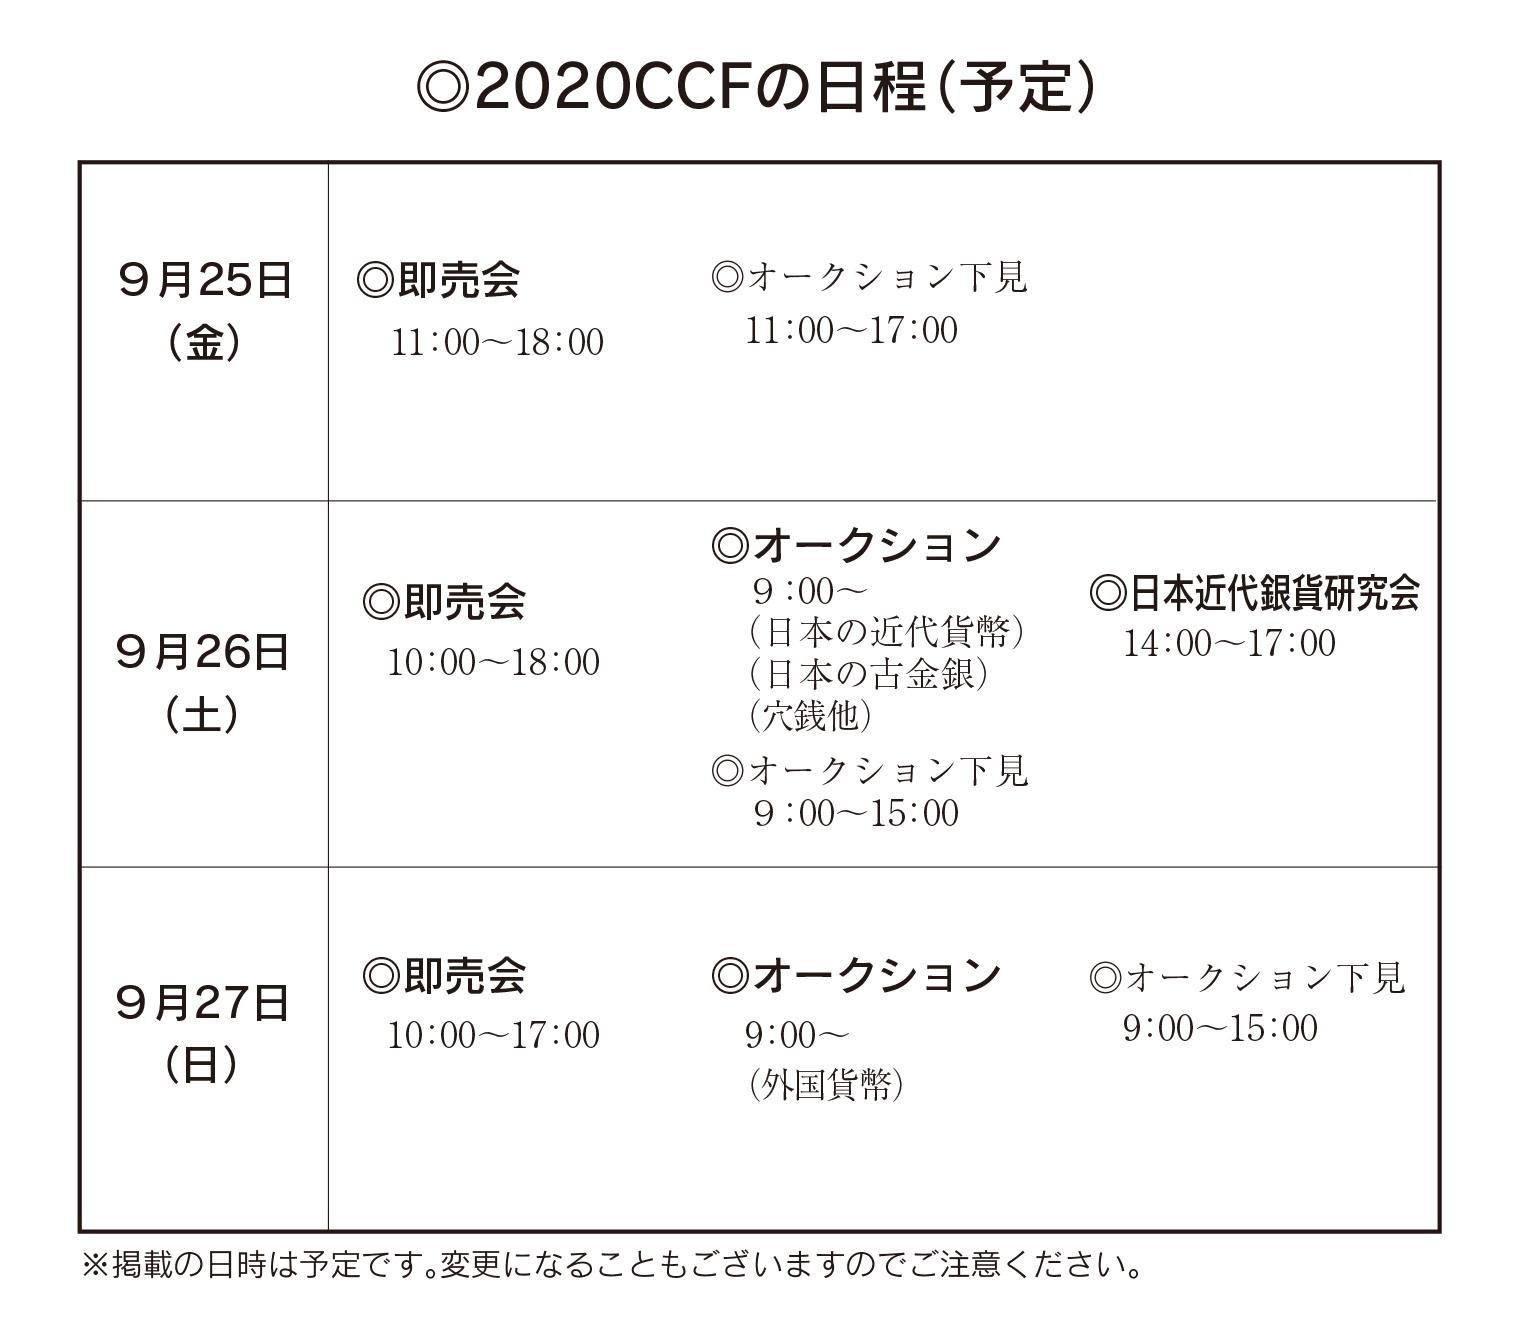 CCFスケジュール